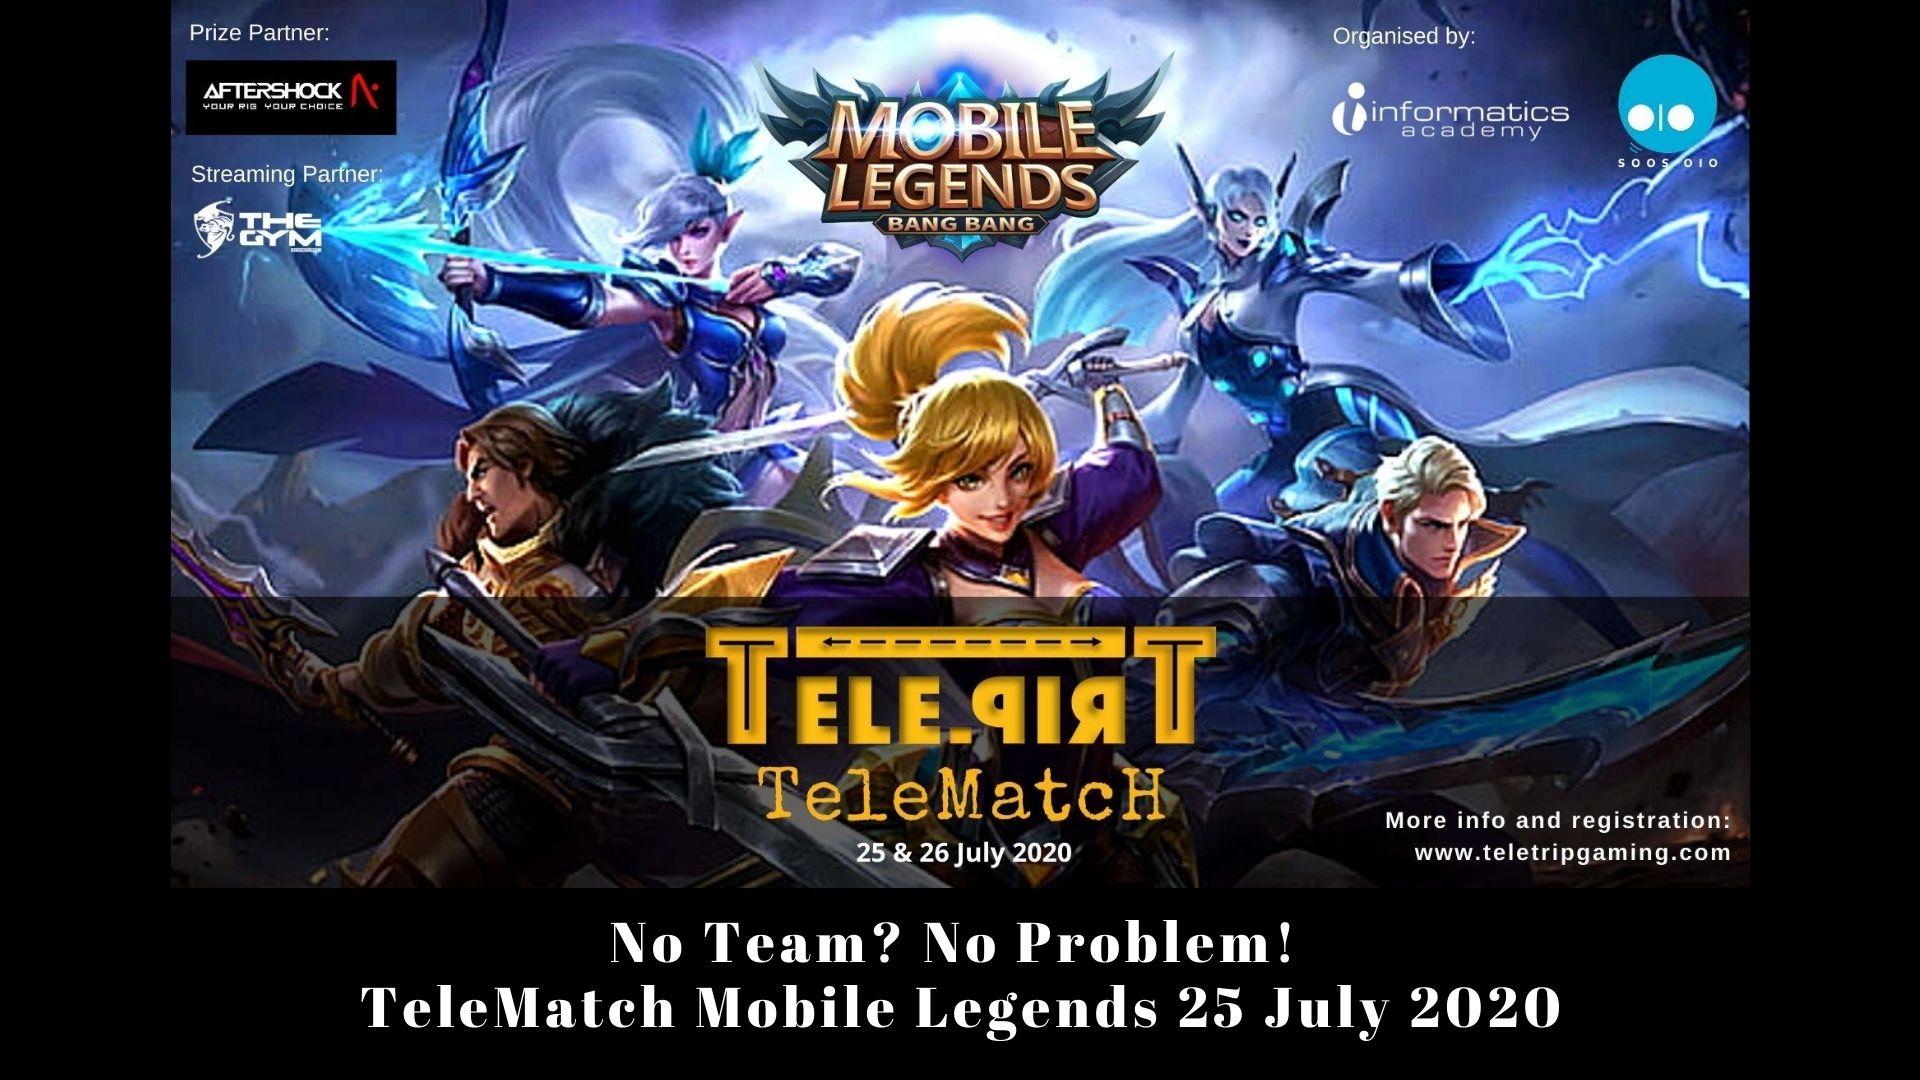 No Team? No Problem! – TeleMatch Mobile Legends 25 July 2020